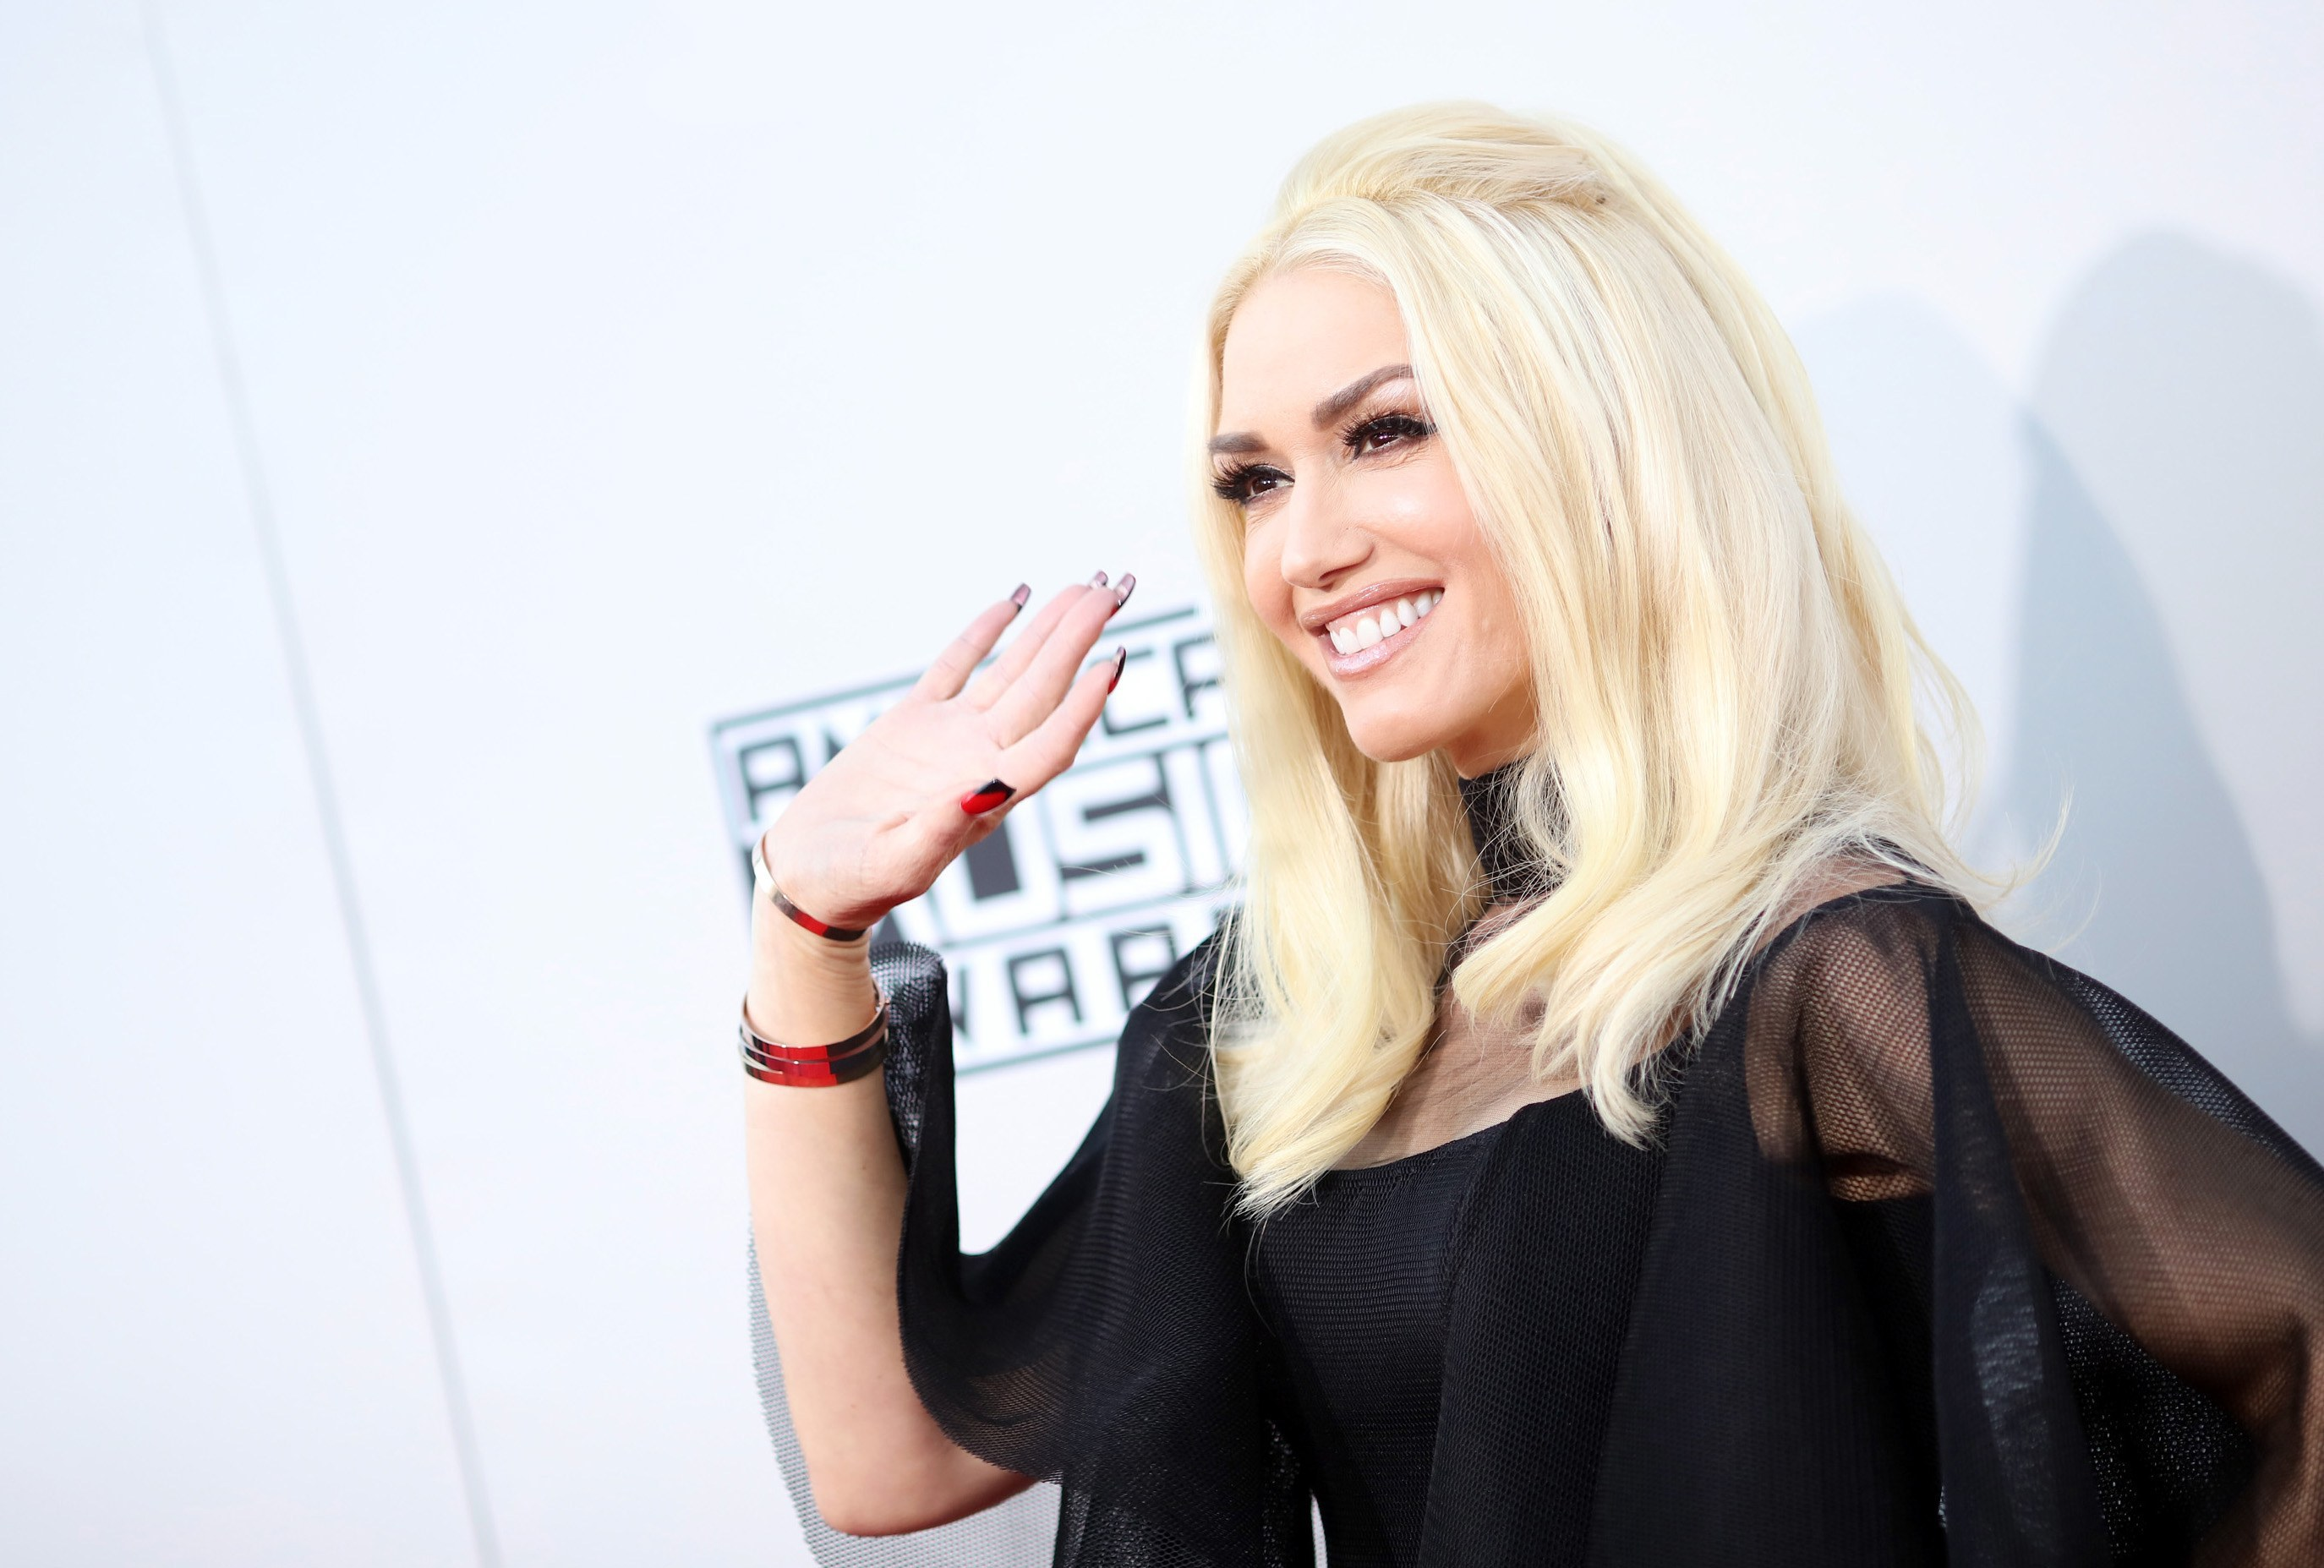 Gwen Stefani Free Download